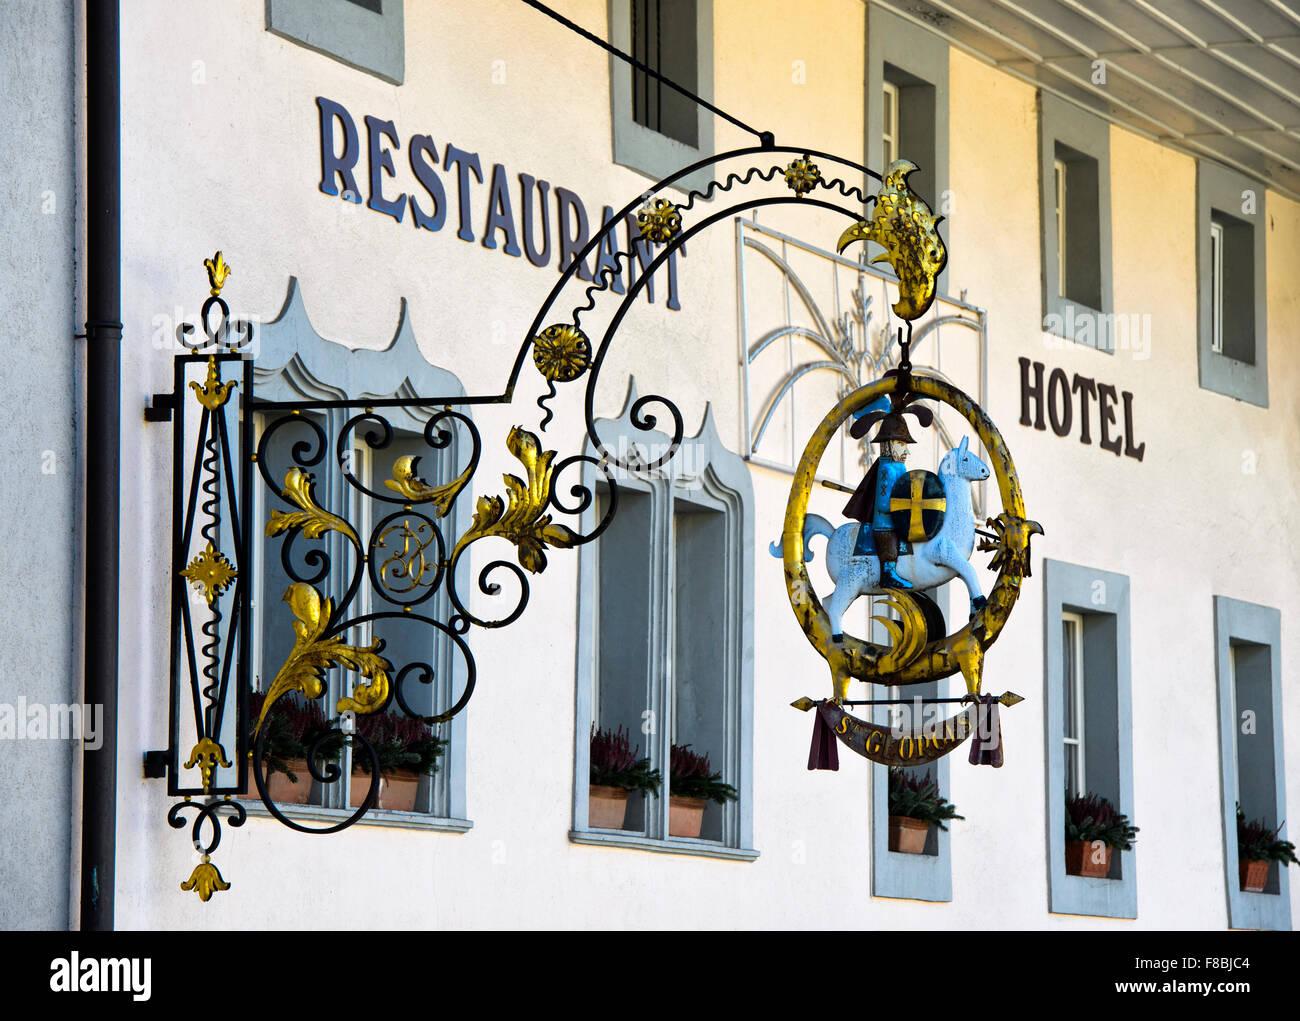 Restaurante firmar con el caballo-rider St. Georg, Hostellerie Saint-Georges, Gruyeres, cantón de Friburgo, Imagen De Stock